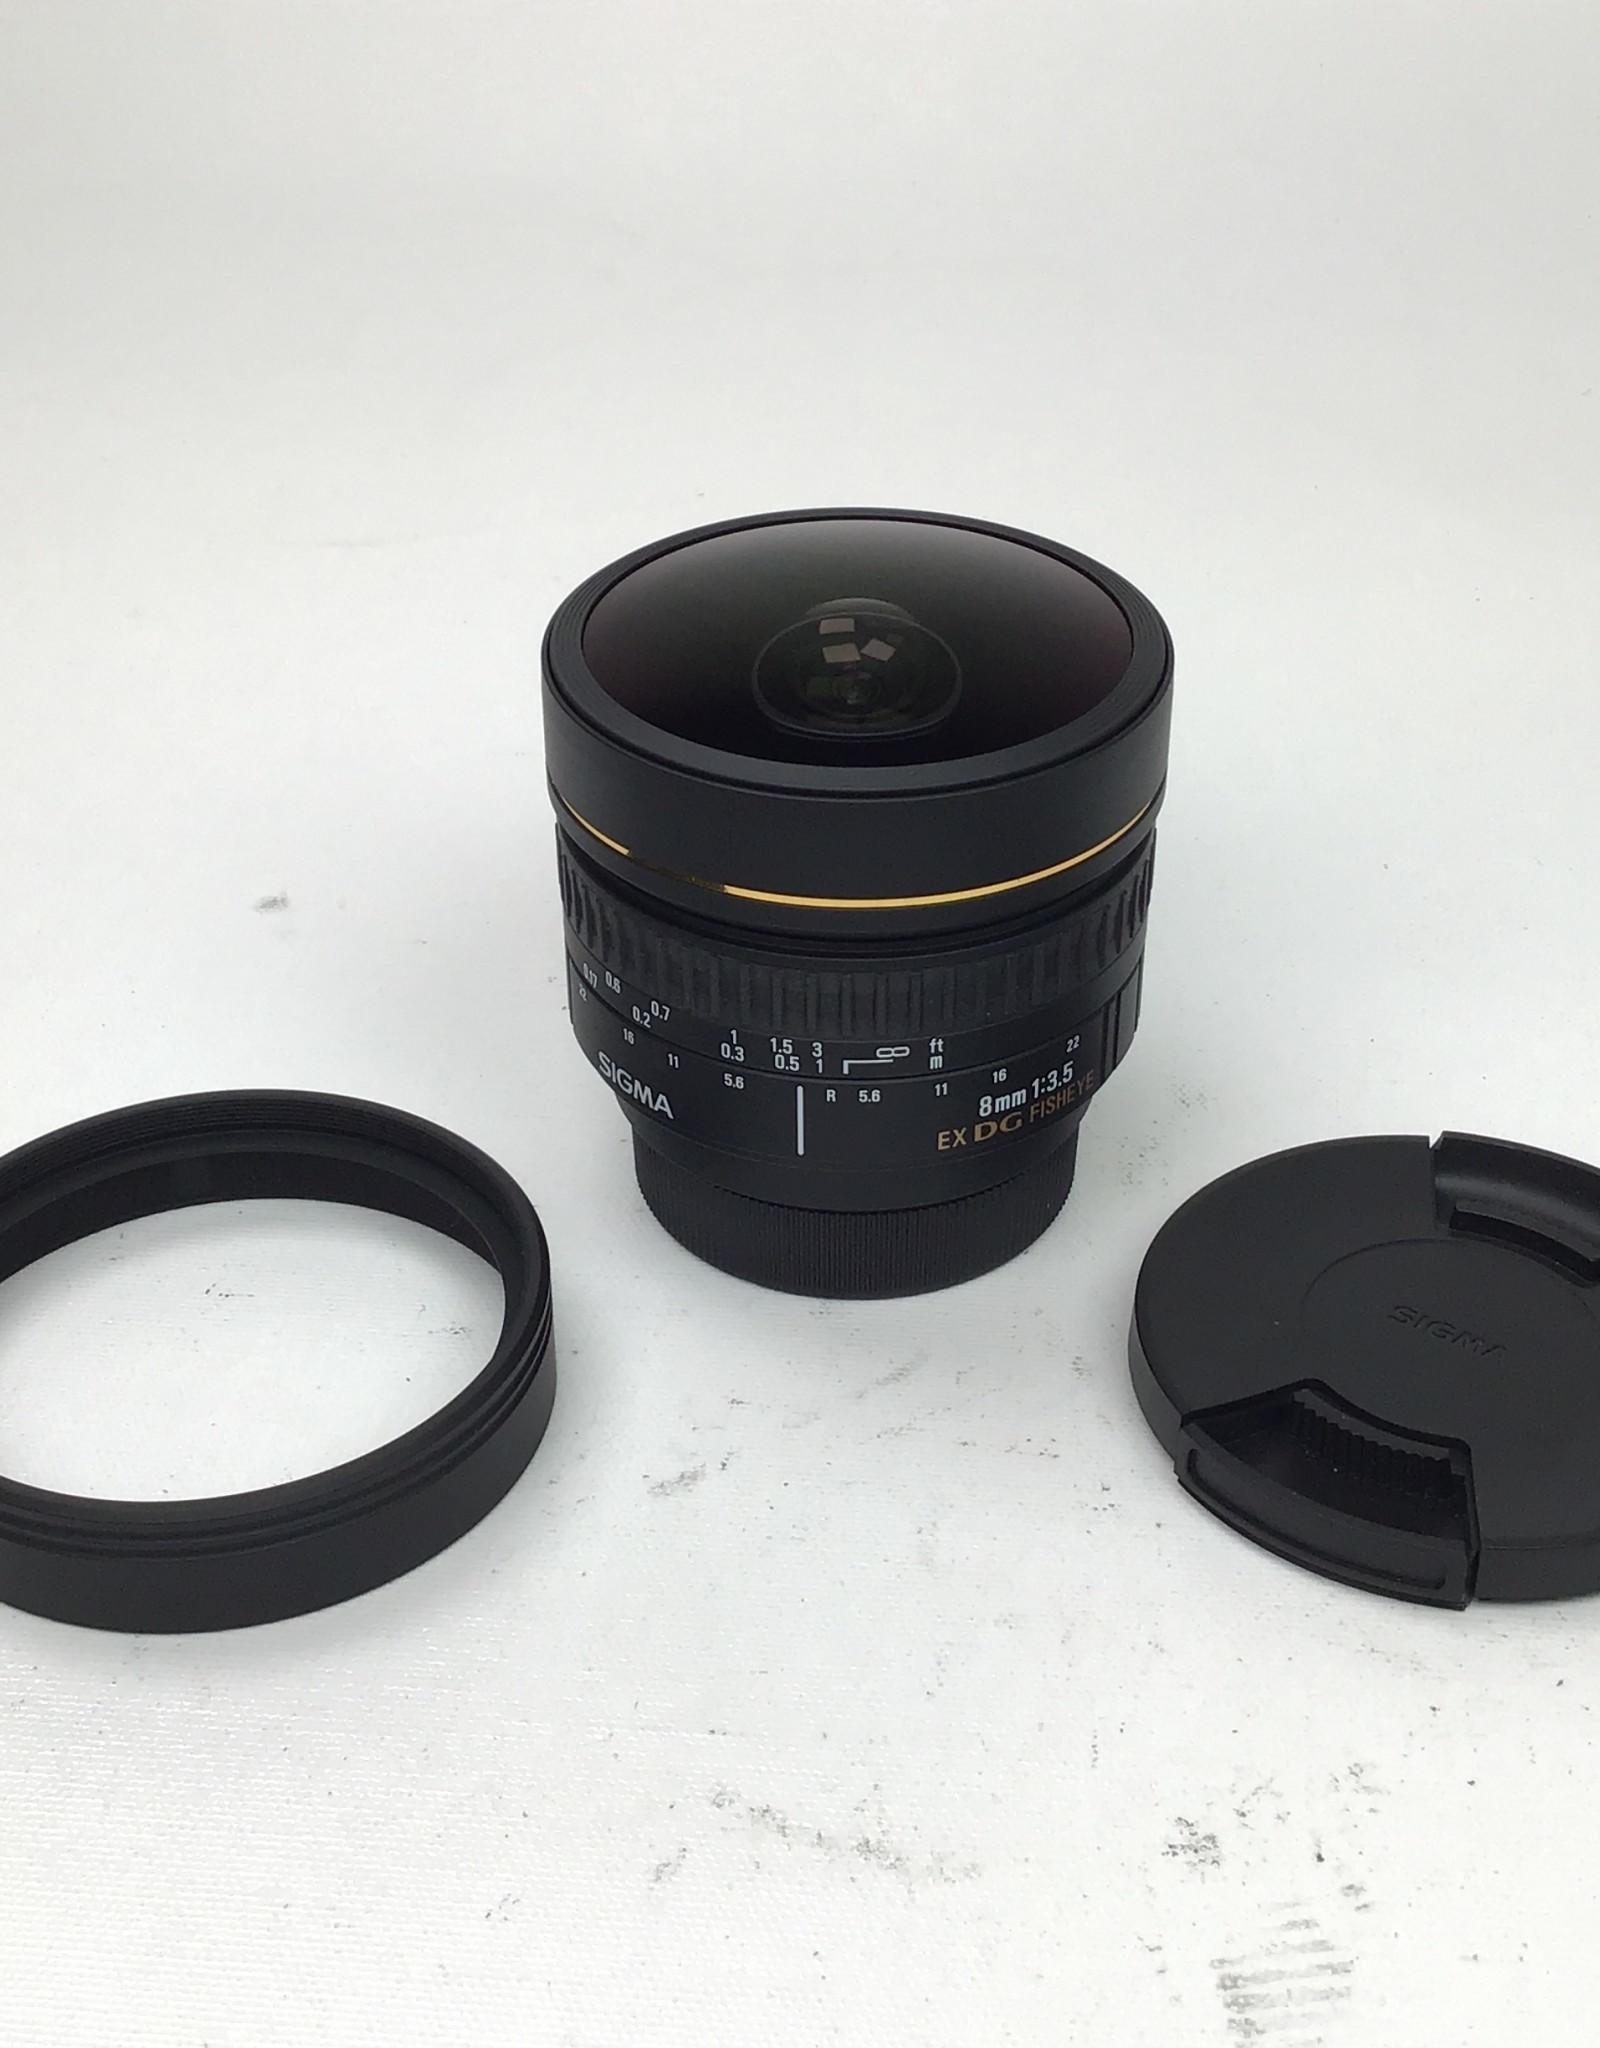 NIKON Sigma 8mm f3.5 EX DG Fisheye Lens Used EX